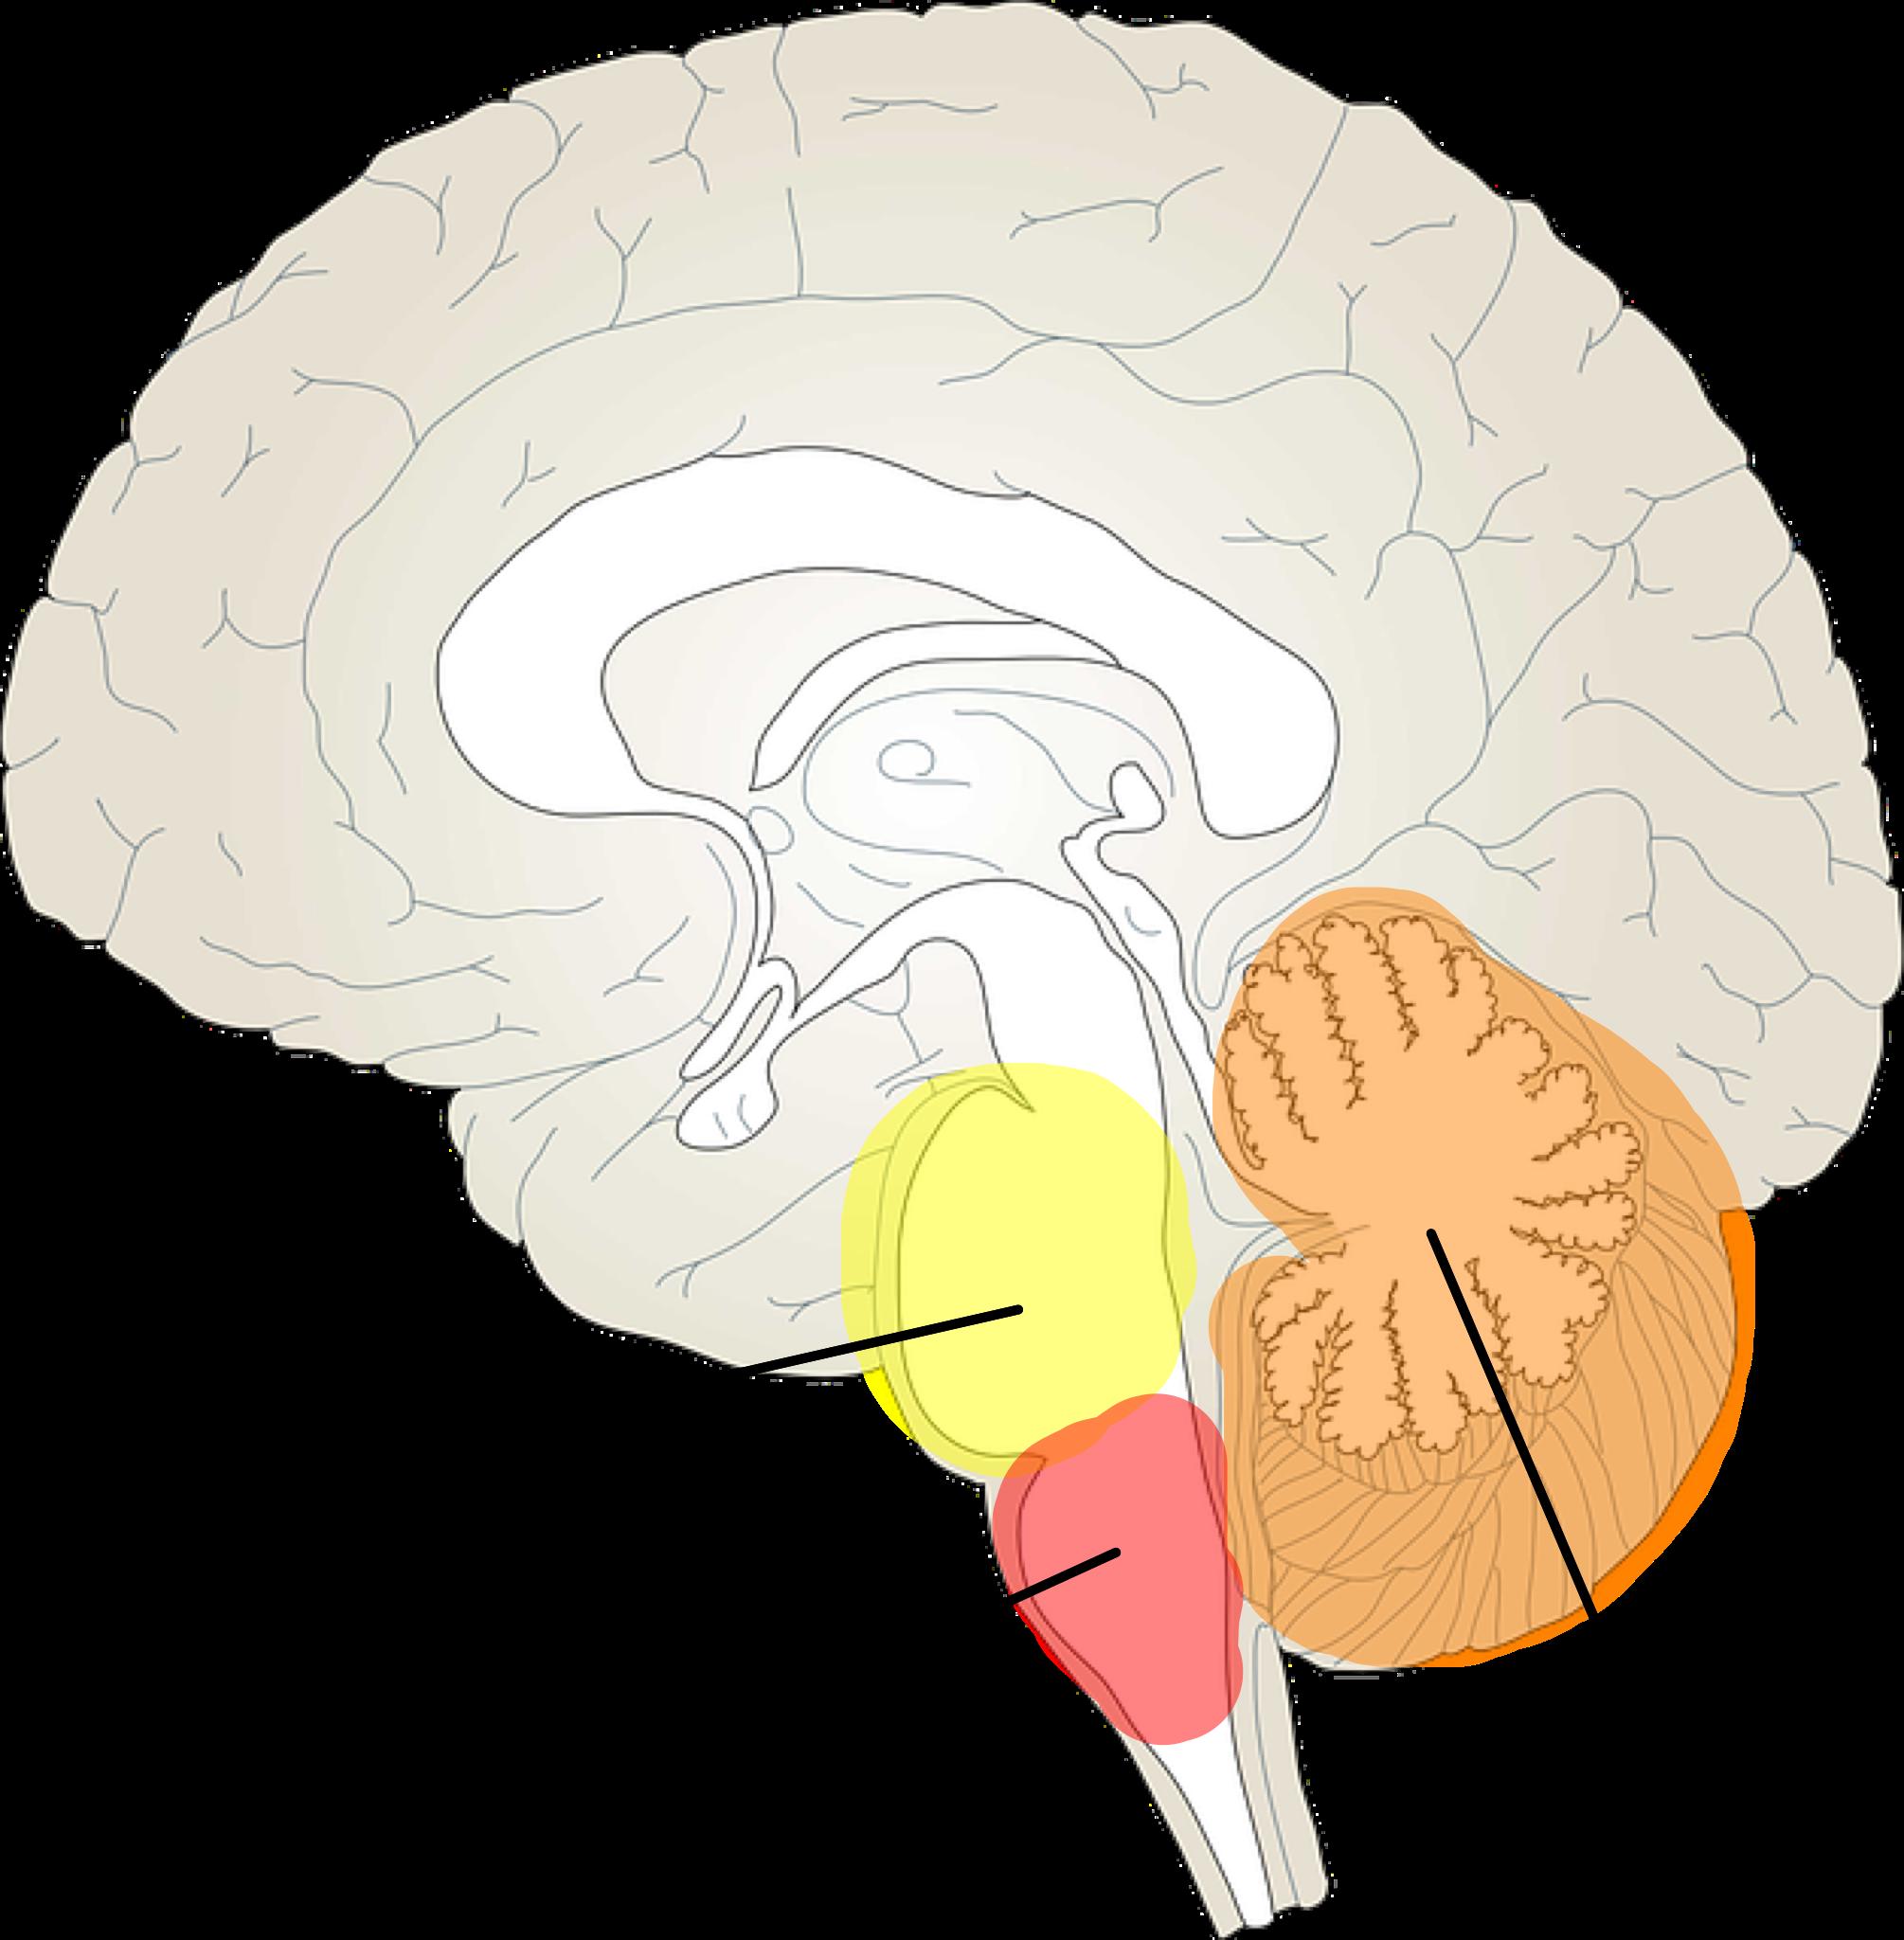 The critical parts of. Clipart brain imagination